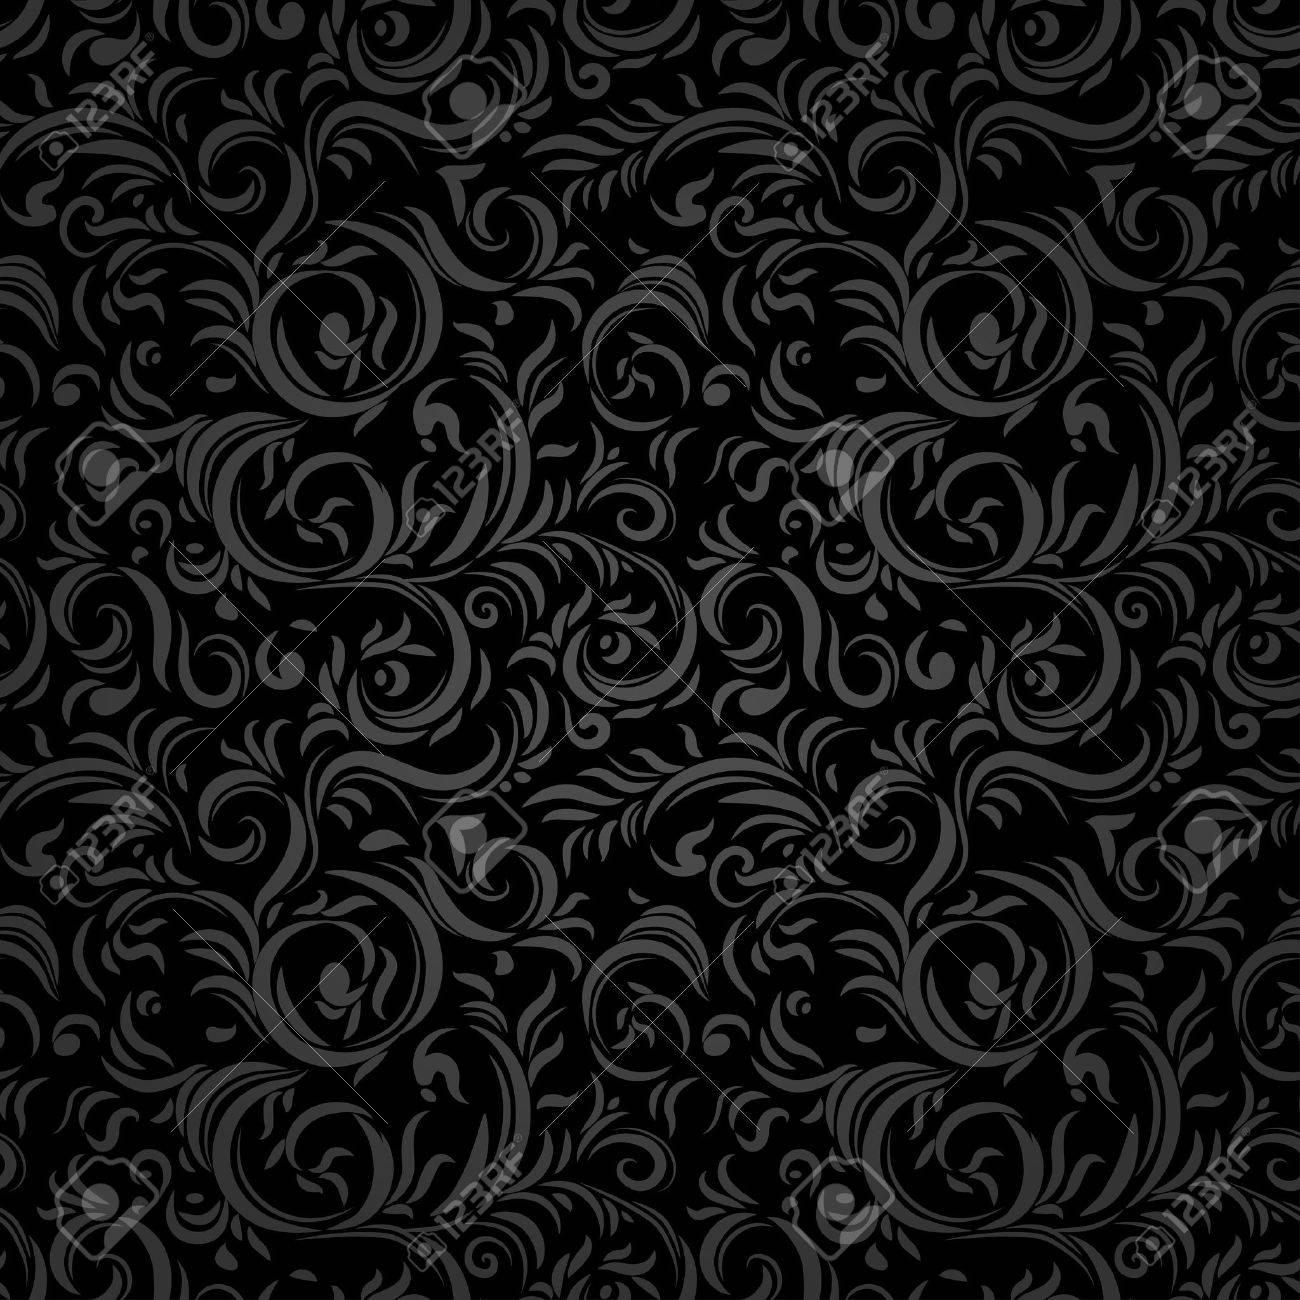 Black stylized seamless pattern. Holiday background. - 46572815